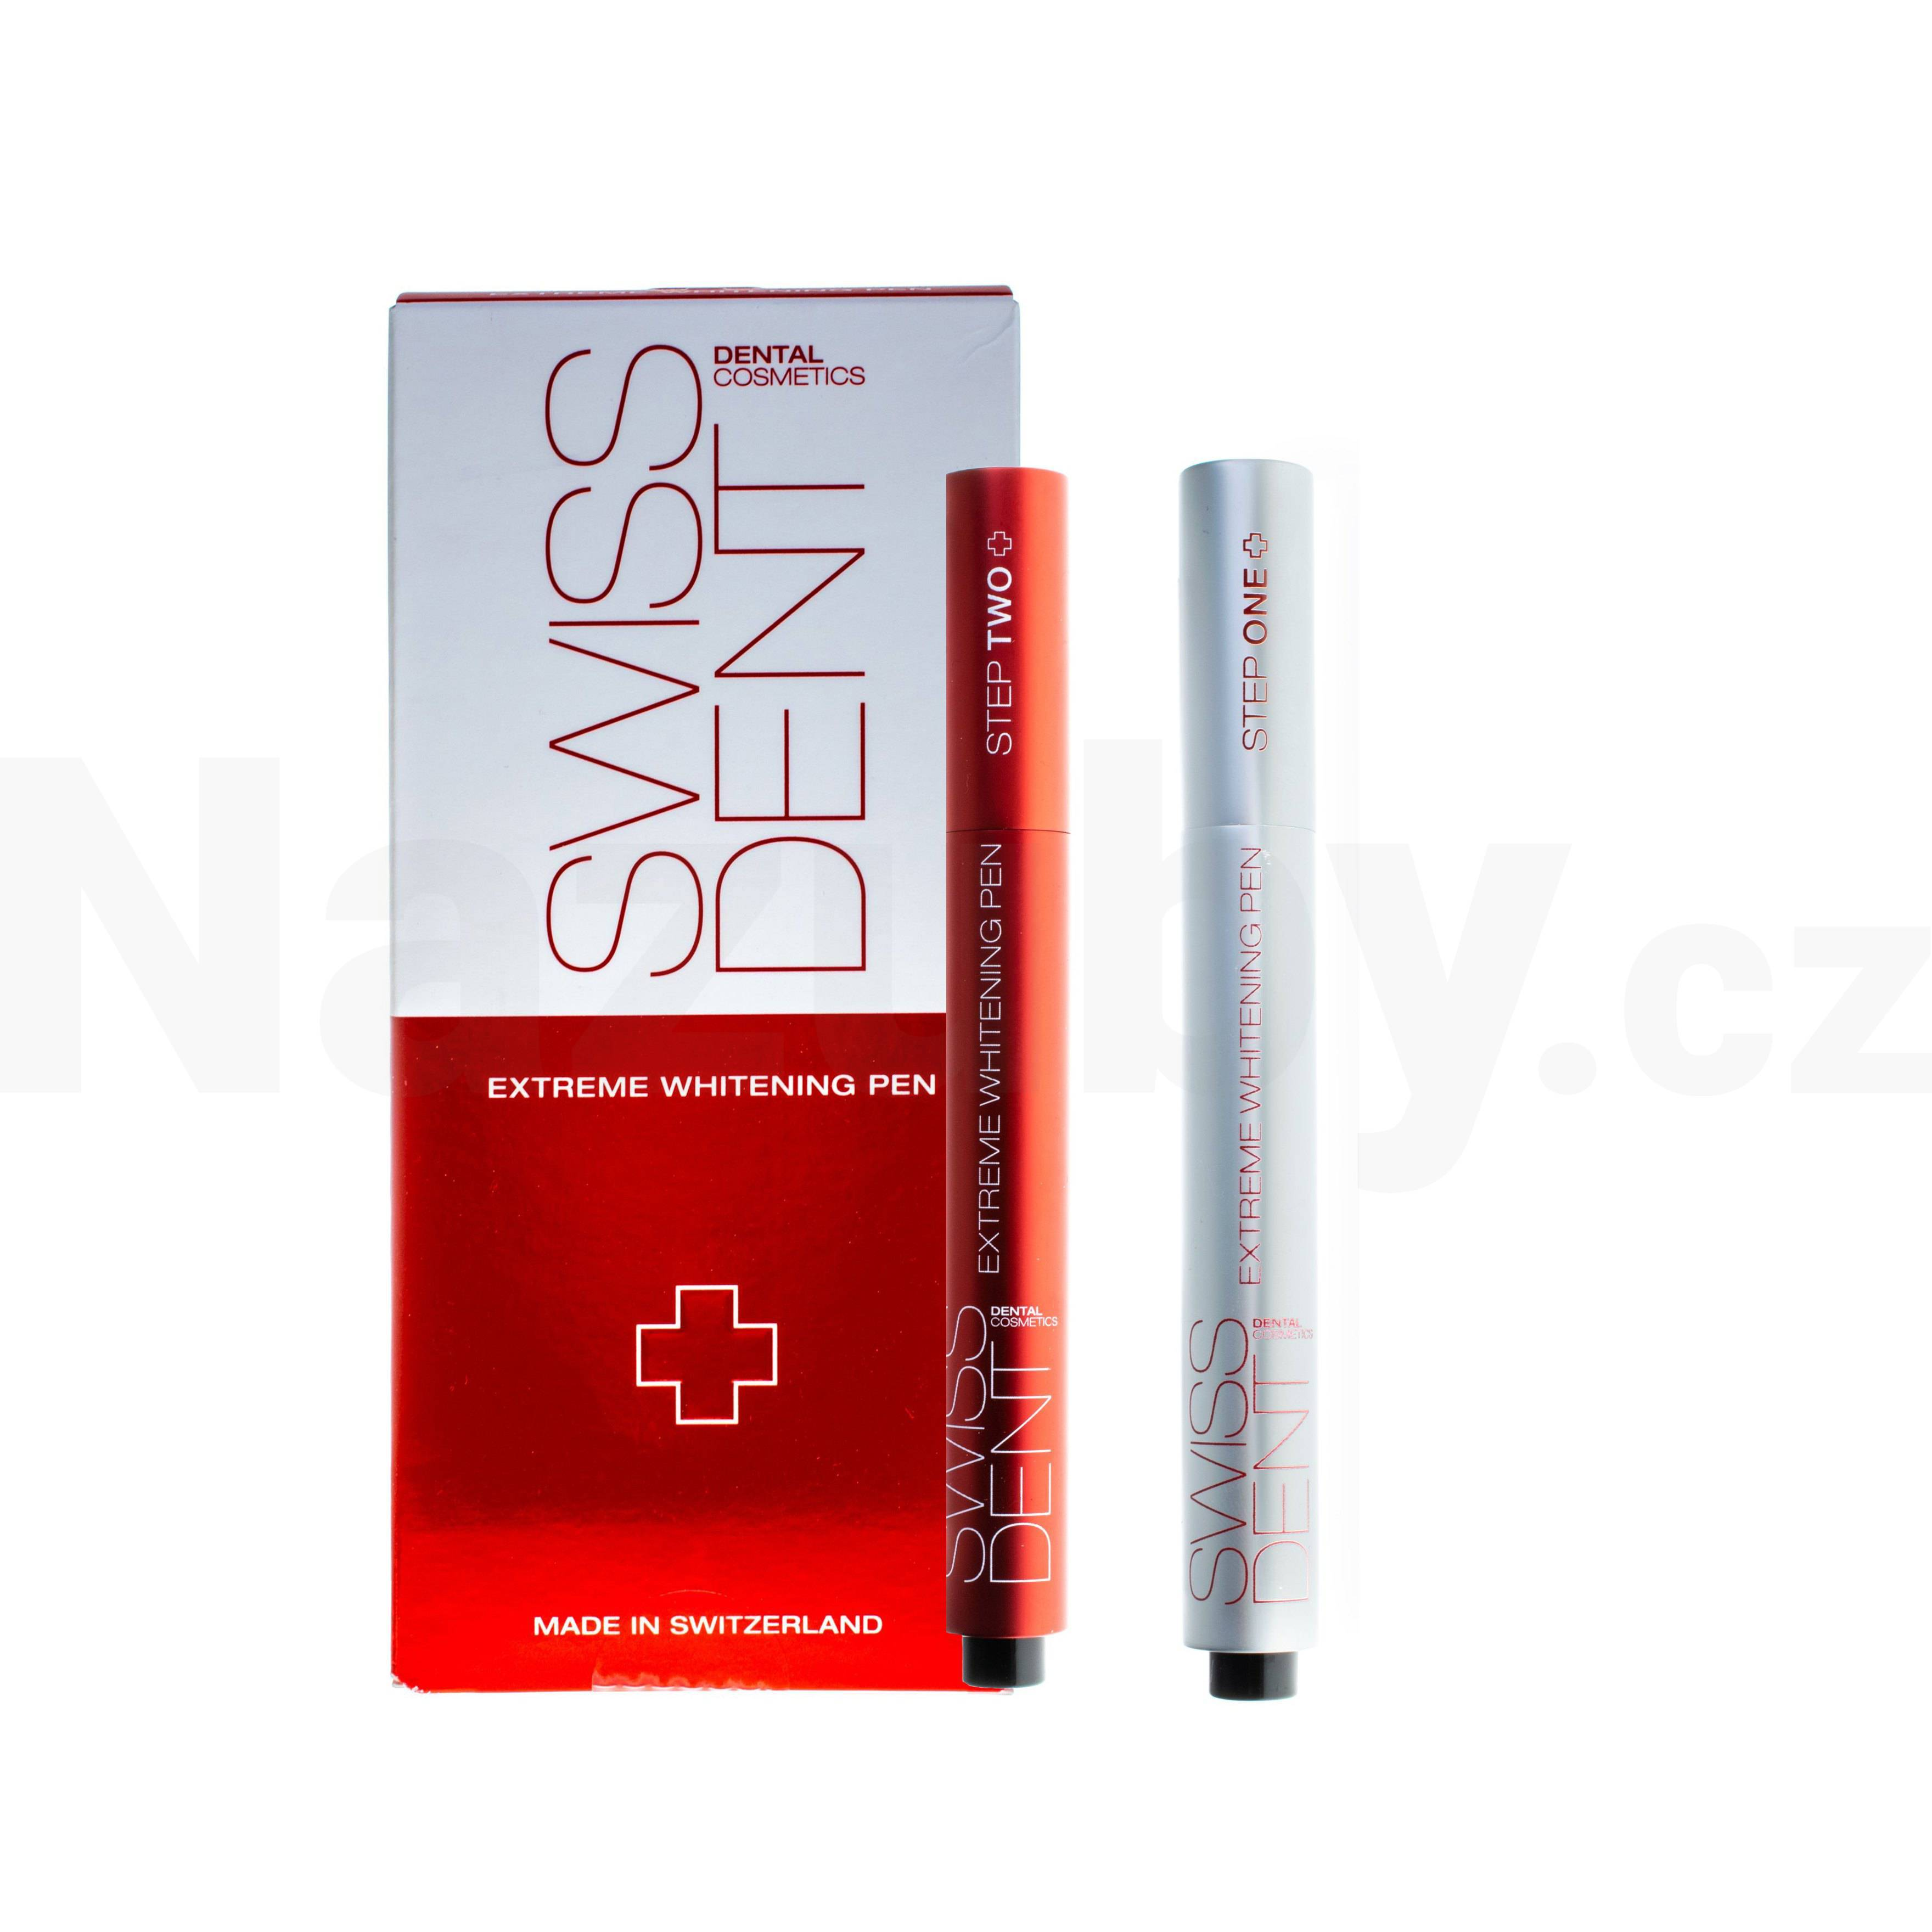 Swissdent Extreme Whitening Pen bělicí pero 2x3 ml